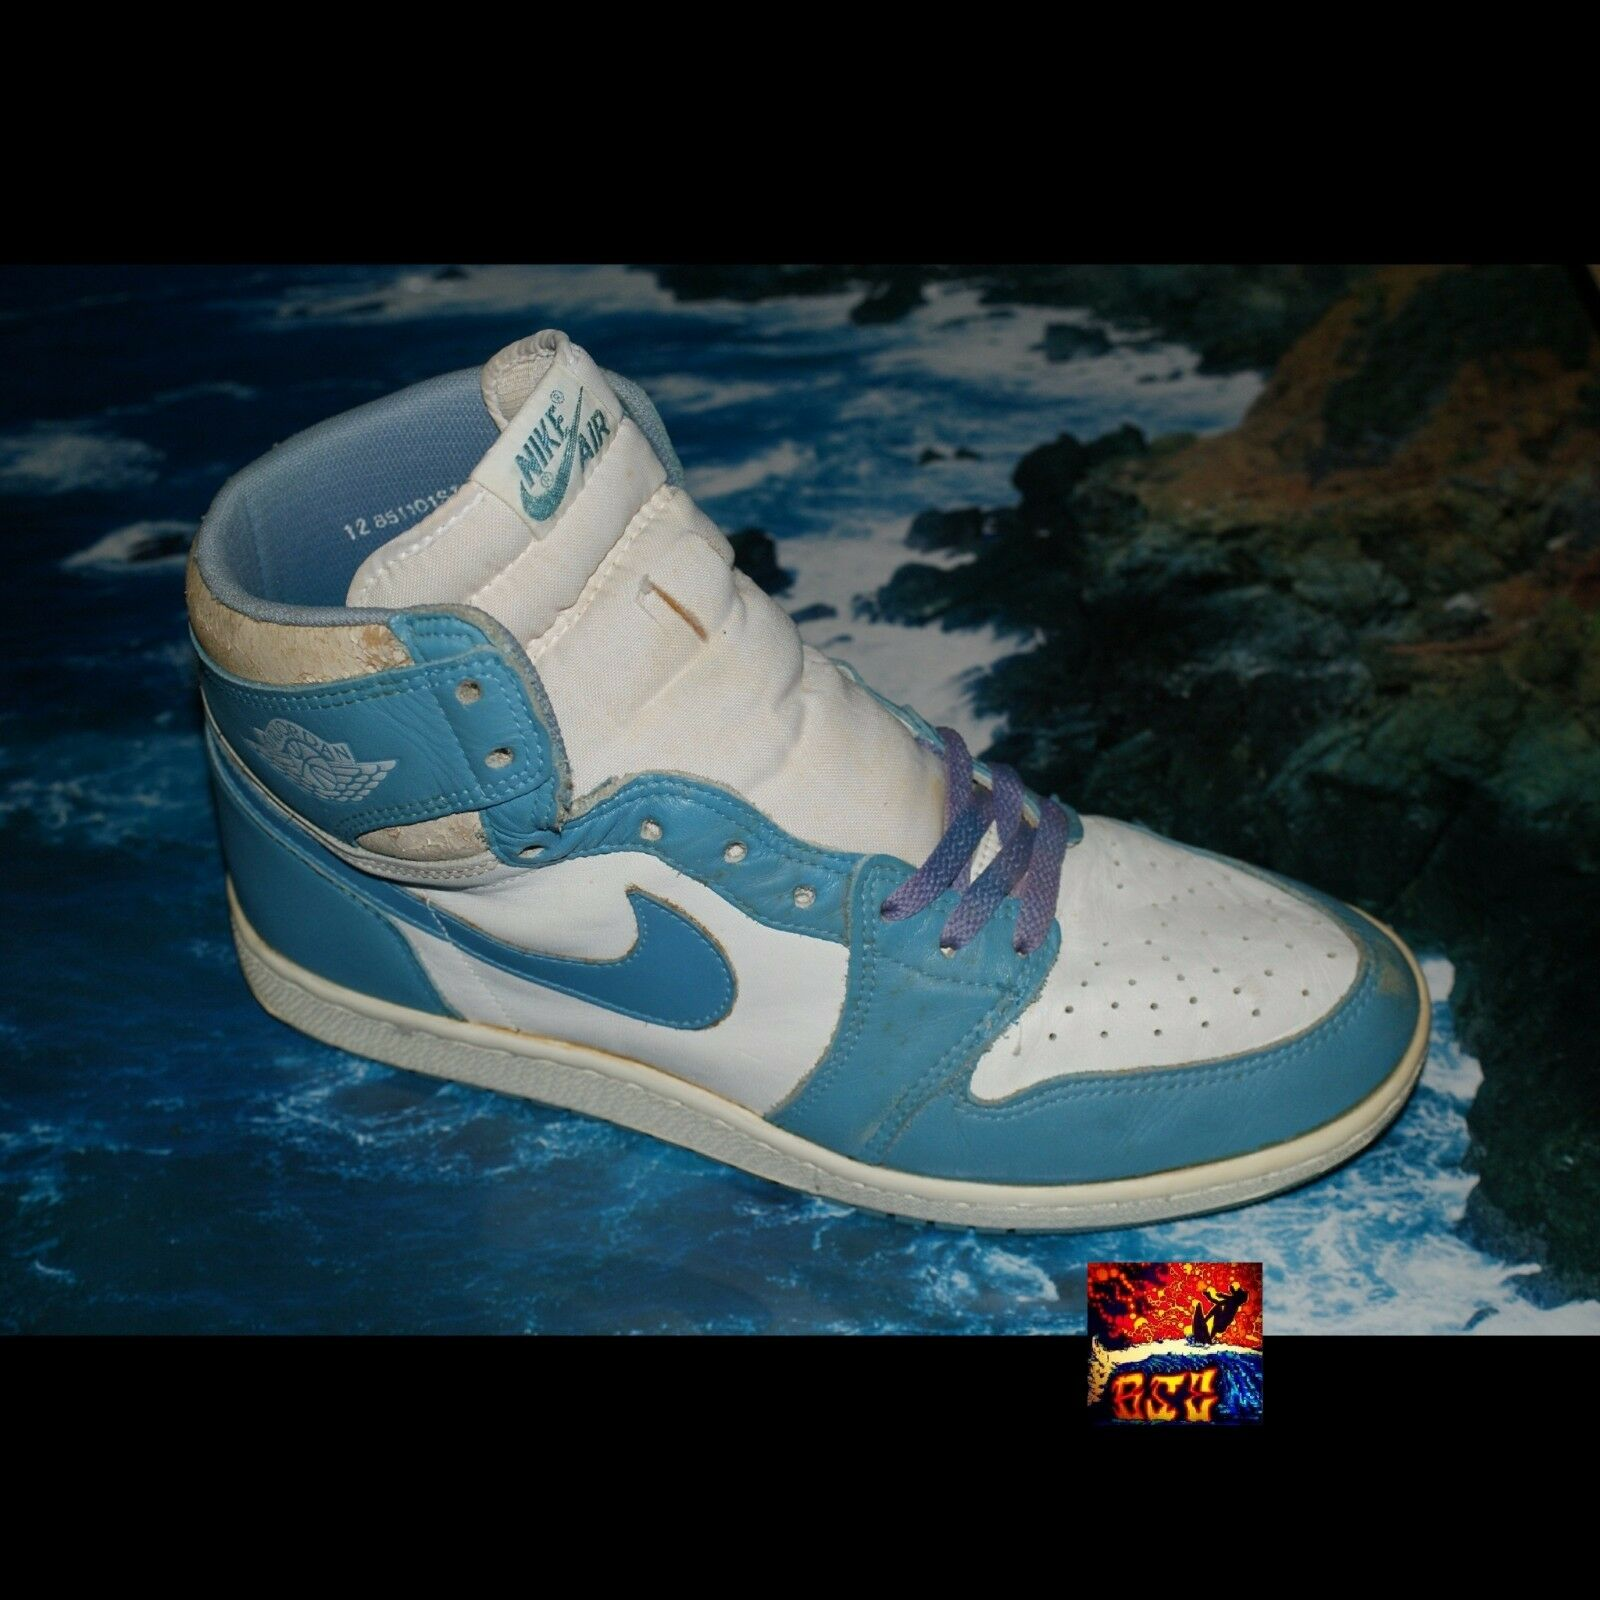 Original 1985 Air Jordan Hi 1  UNC  - UNIVERSITY blueE WHITE - SIZE 12 PreOwned I